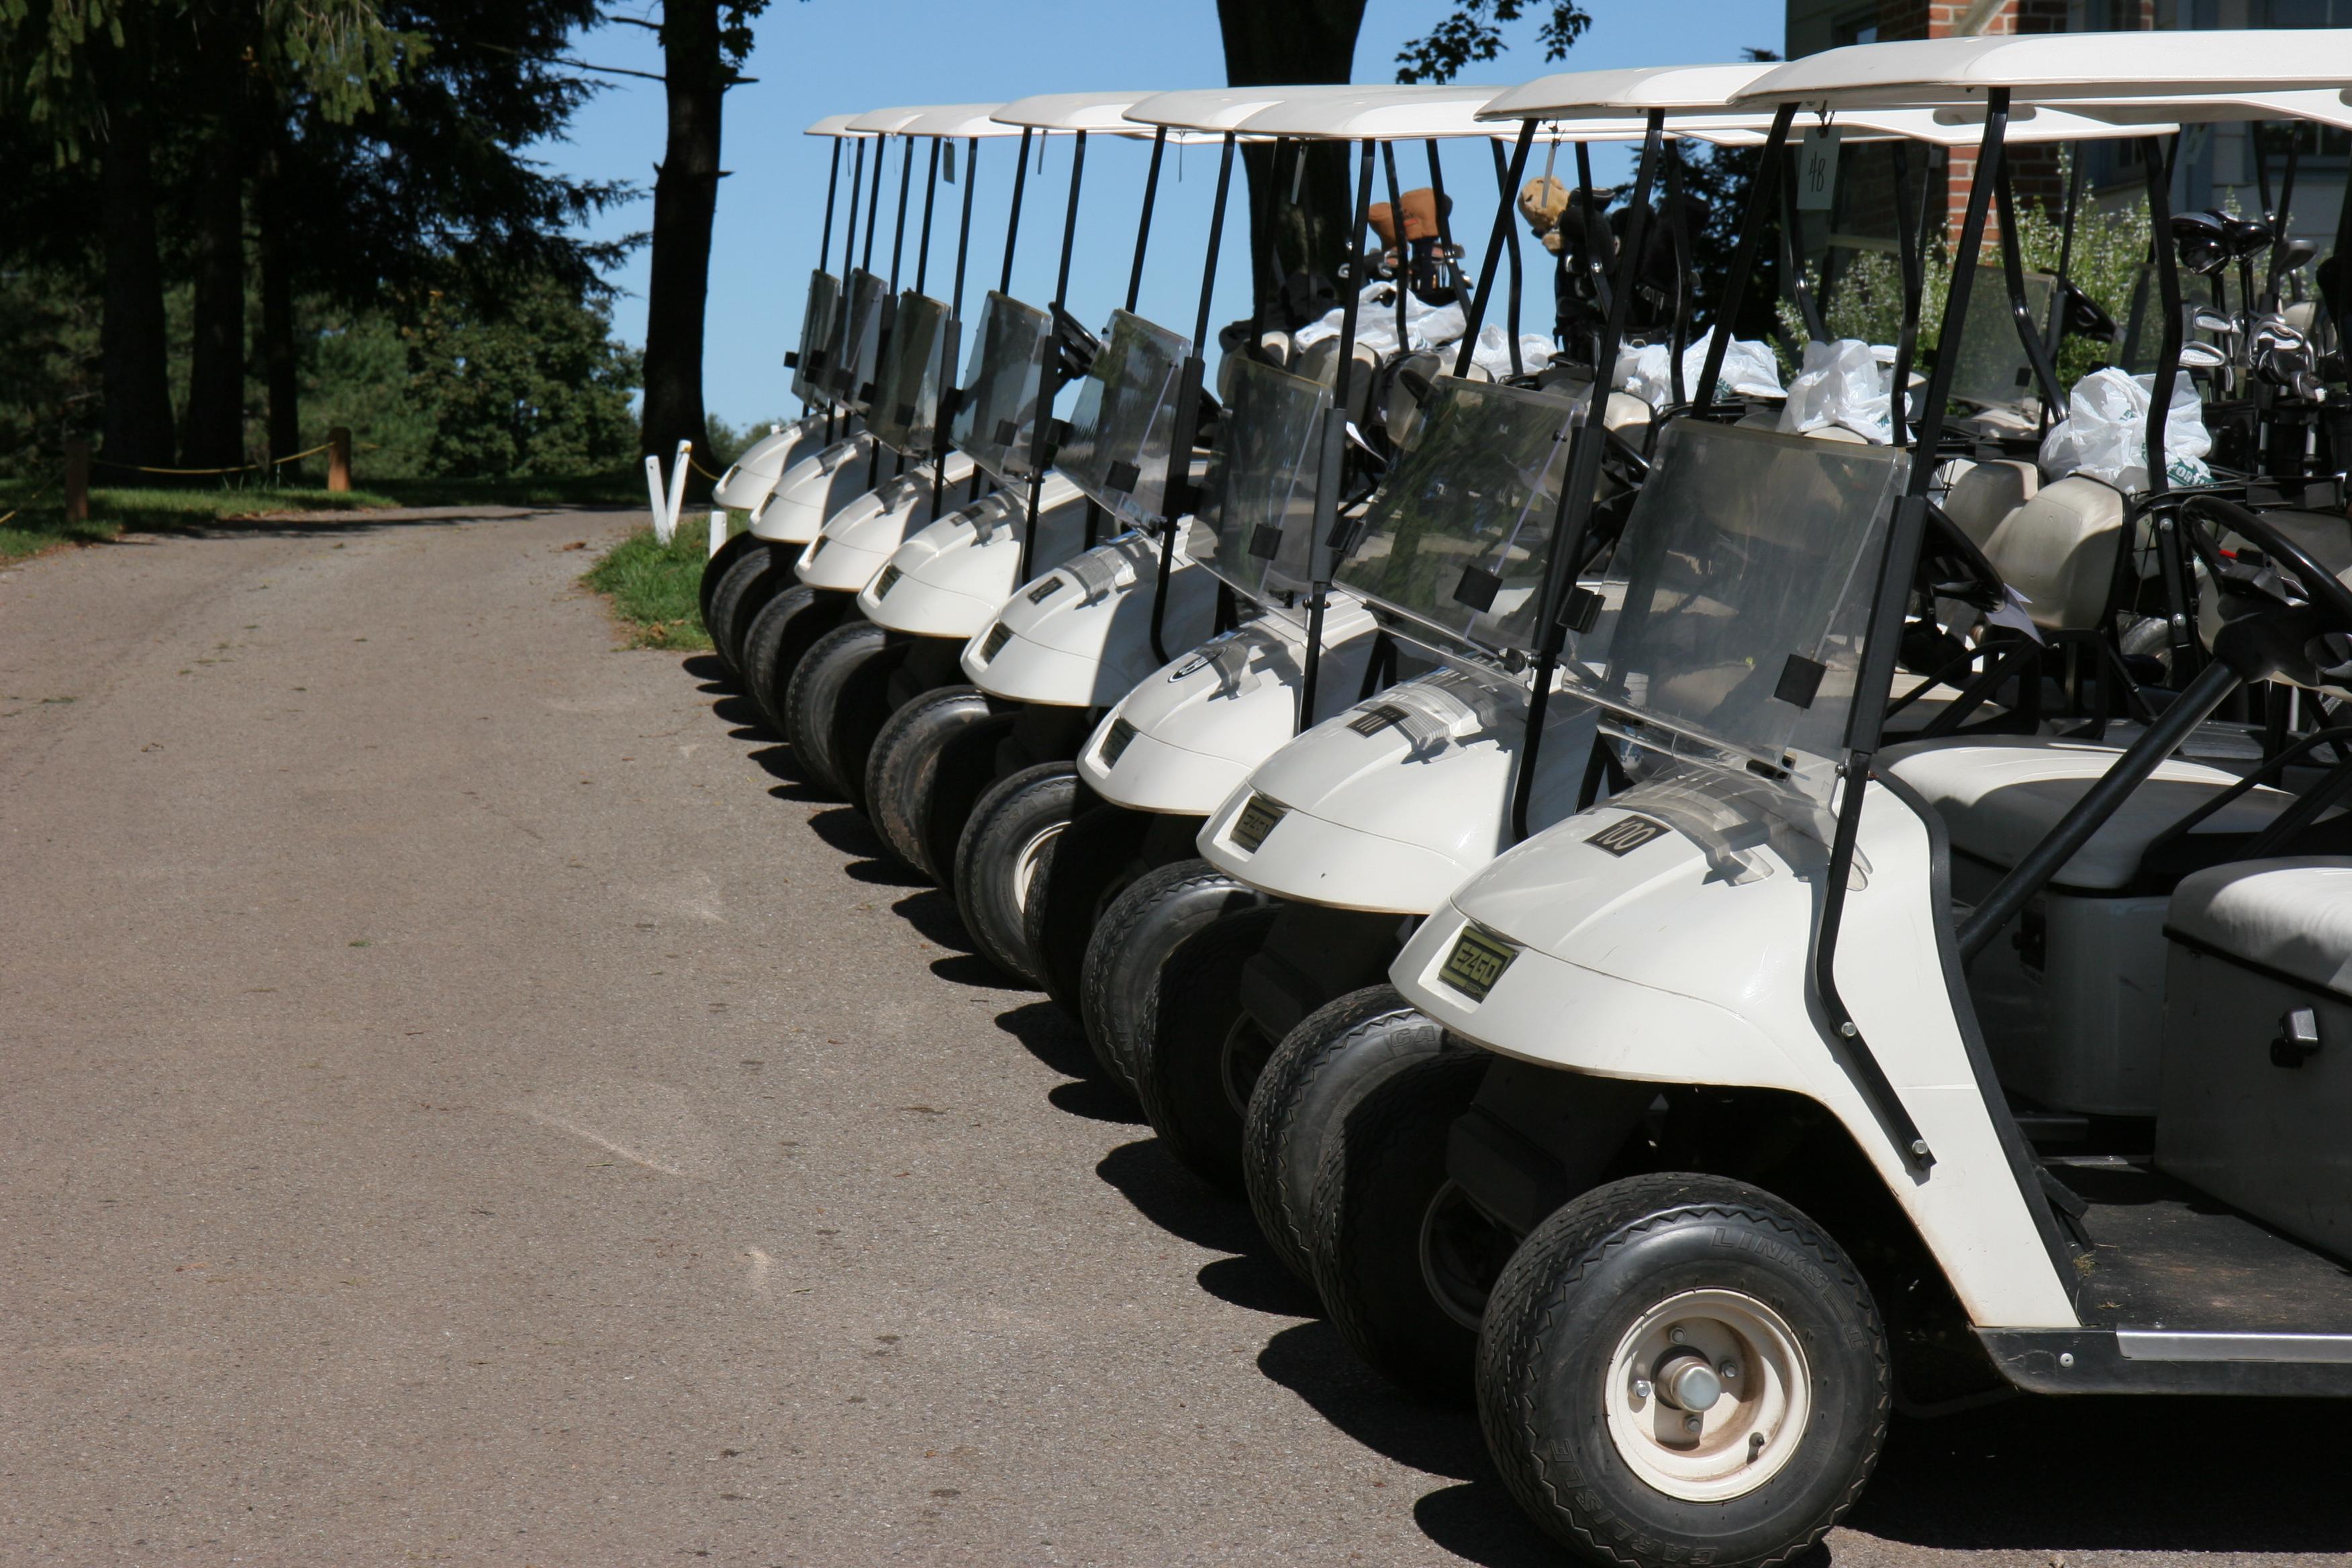 Servants 11th Annual Golf Outing - Default Image of Par Sponsor